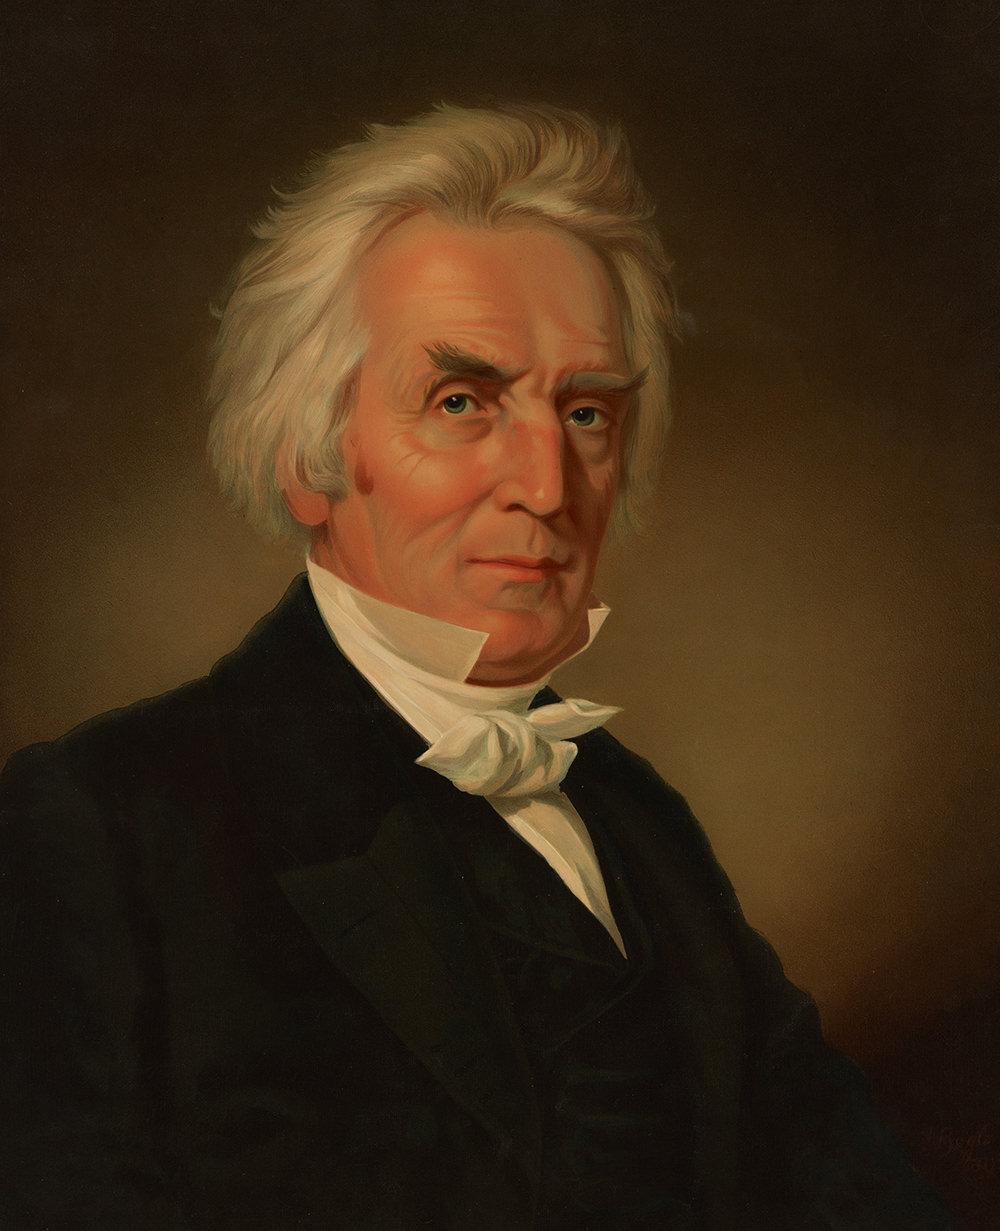 Foto gratis de Alexander Campbell alrededor de 1855